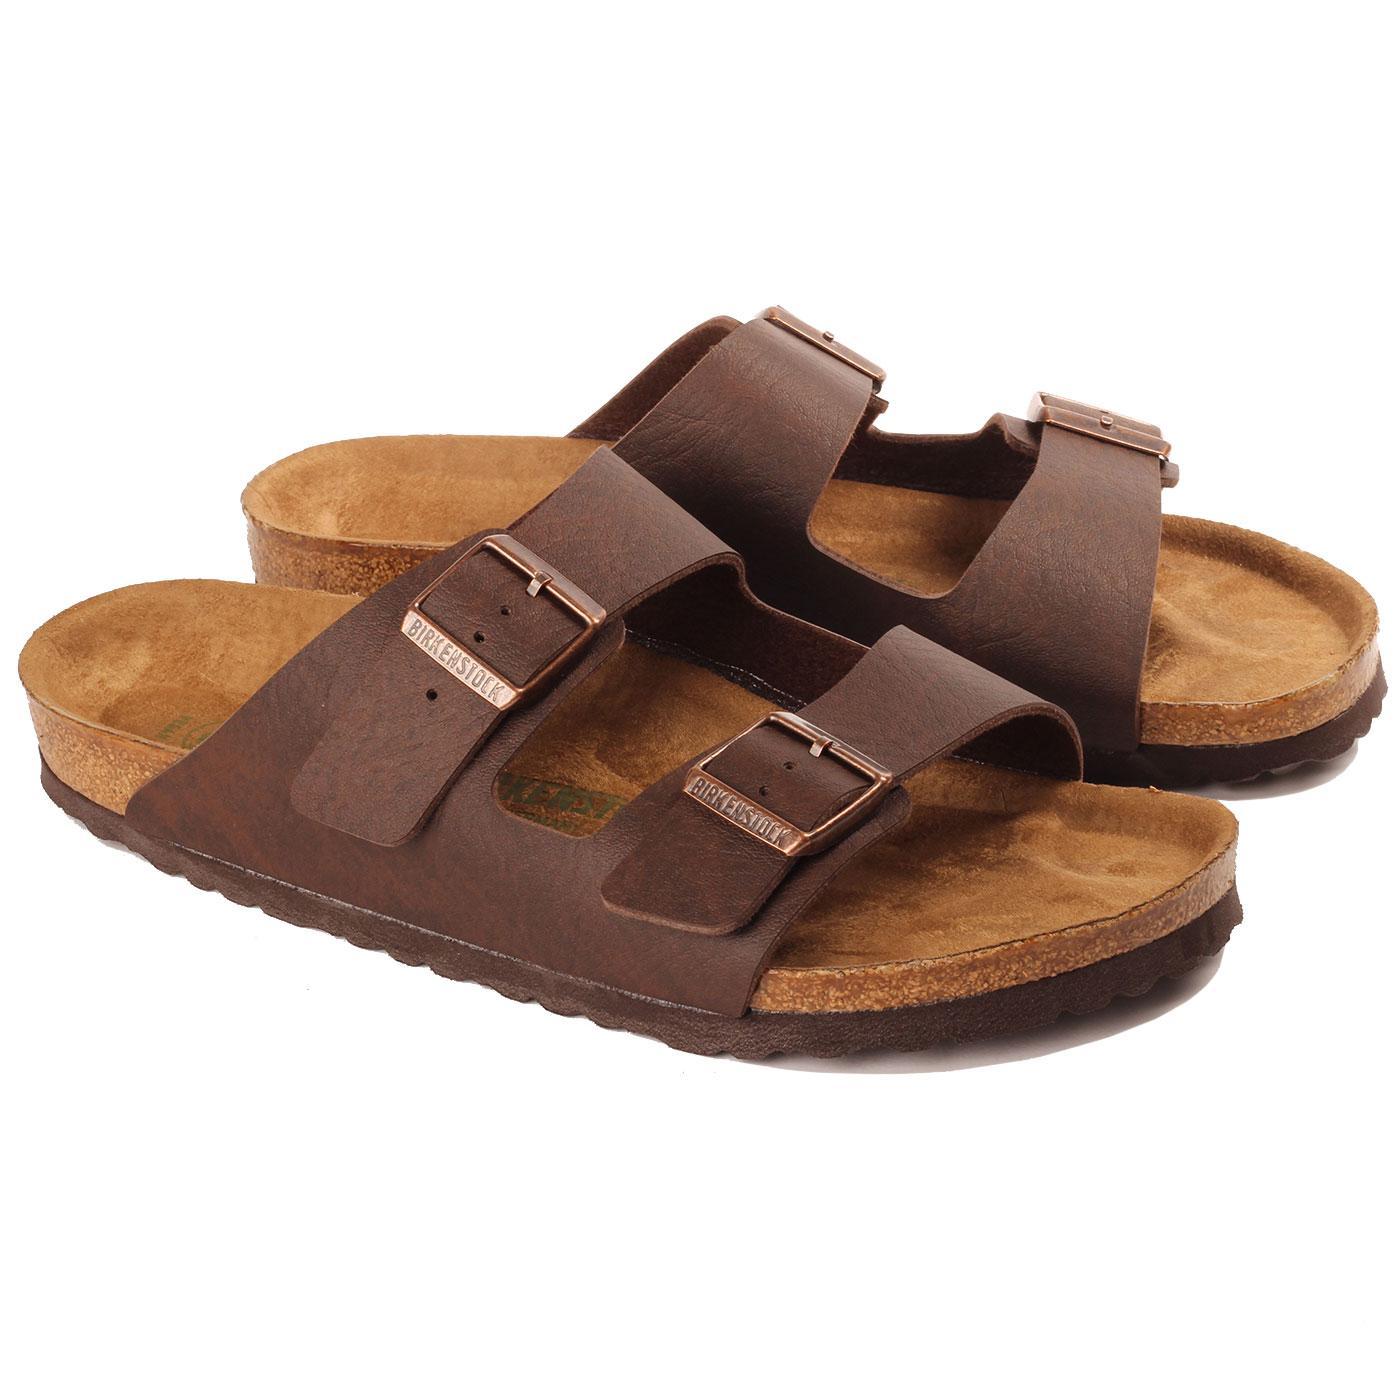 Arizona BF BIRKENSTOCK Men's Vegan Sandals SMB